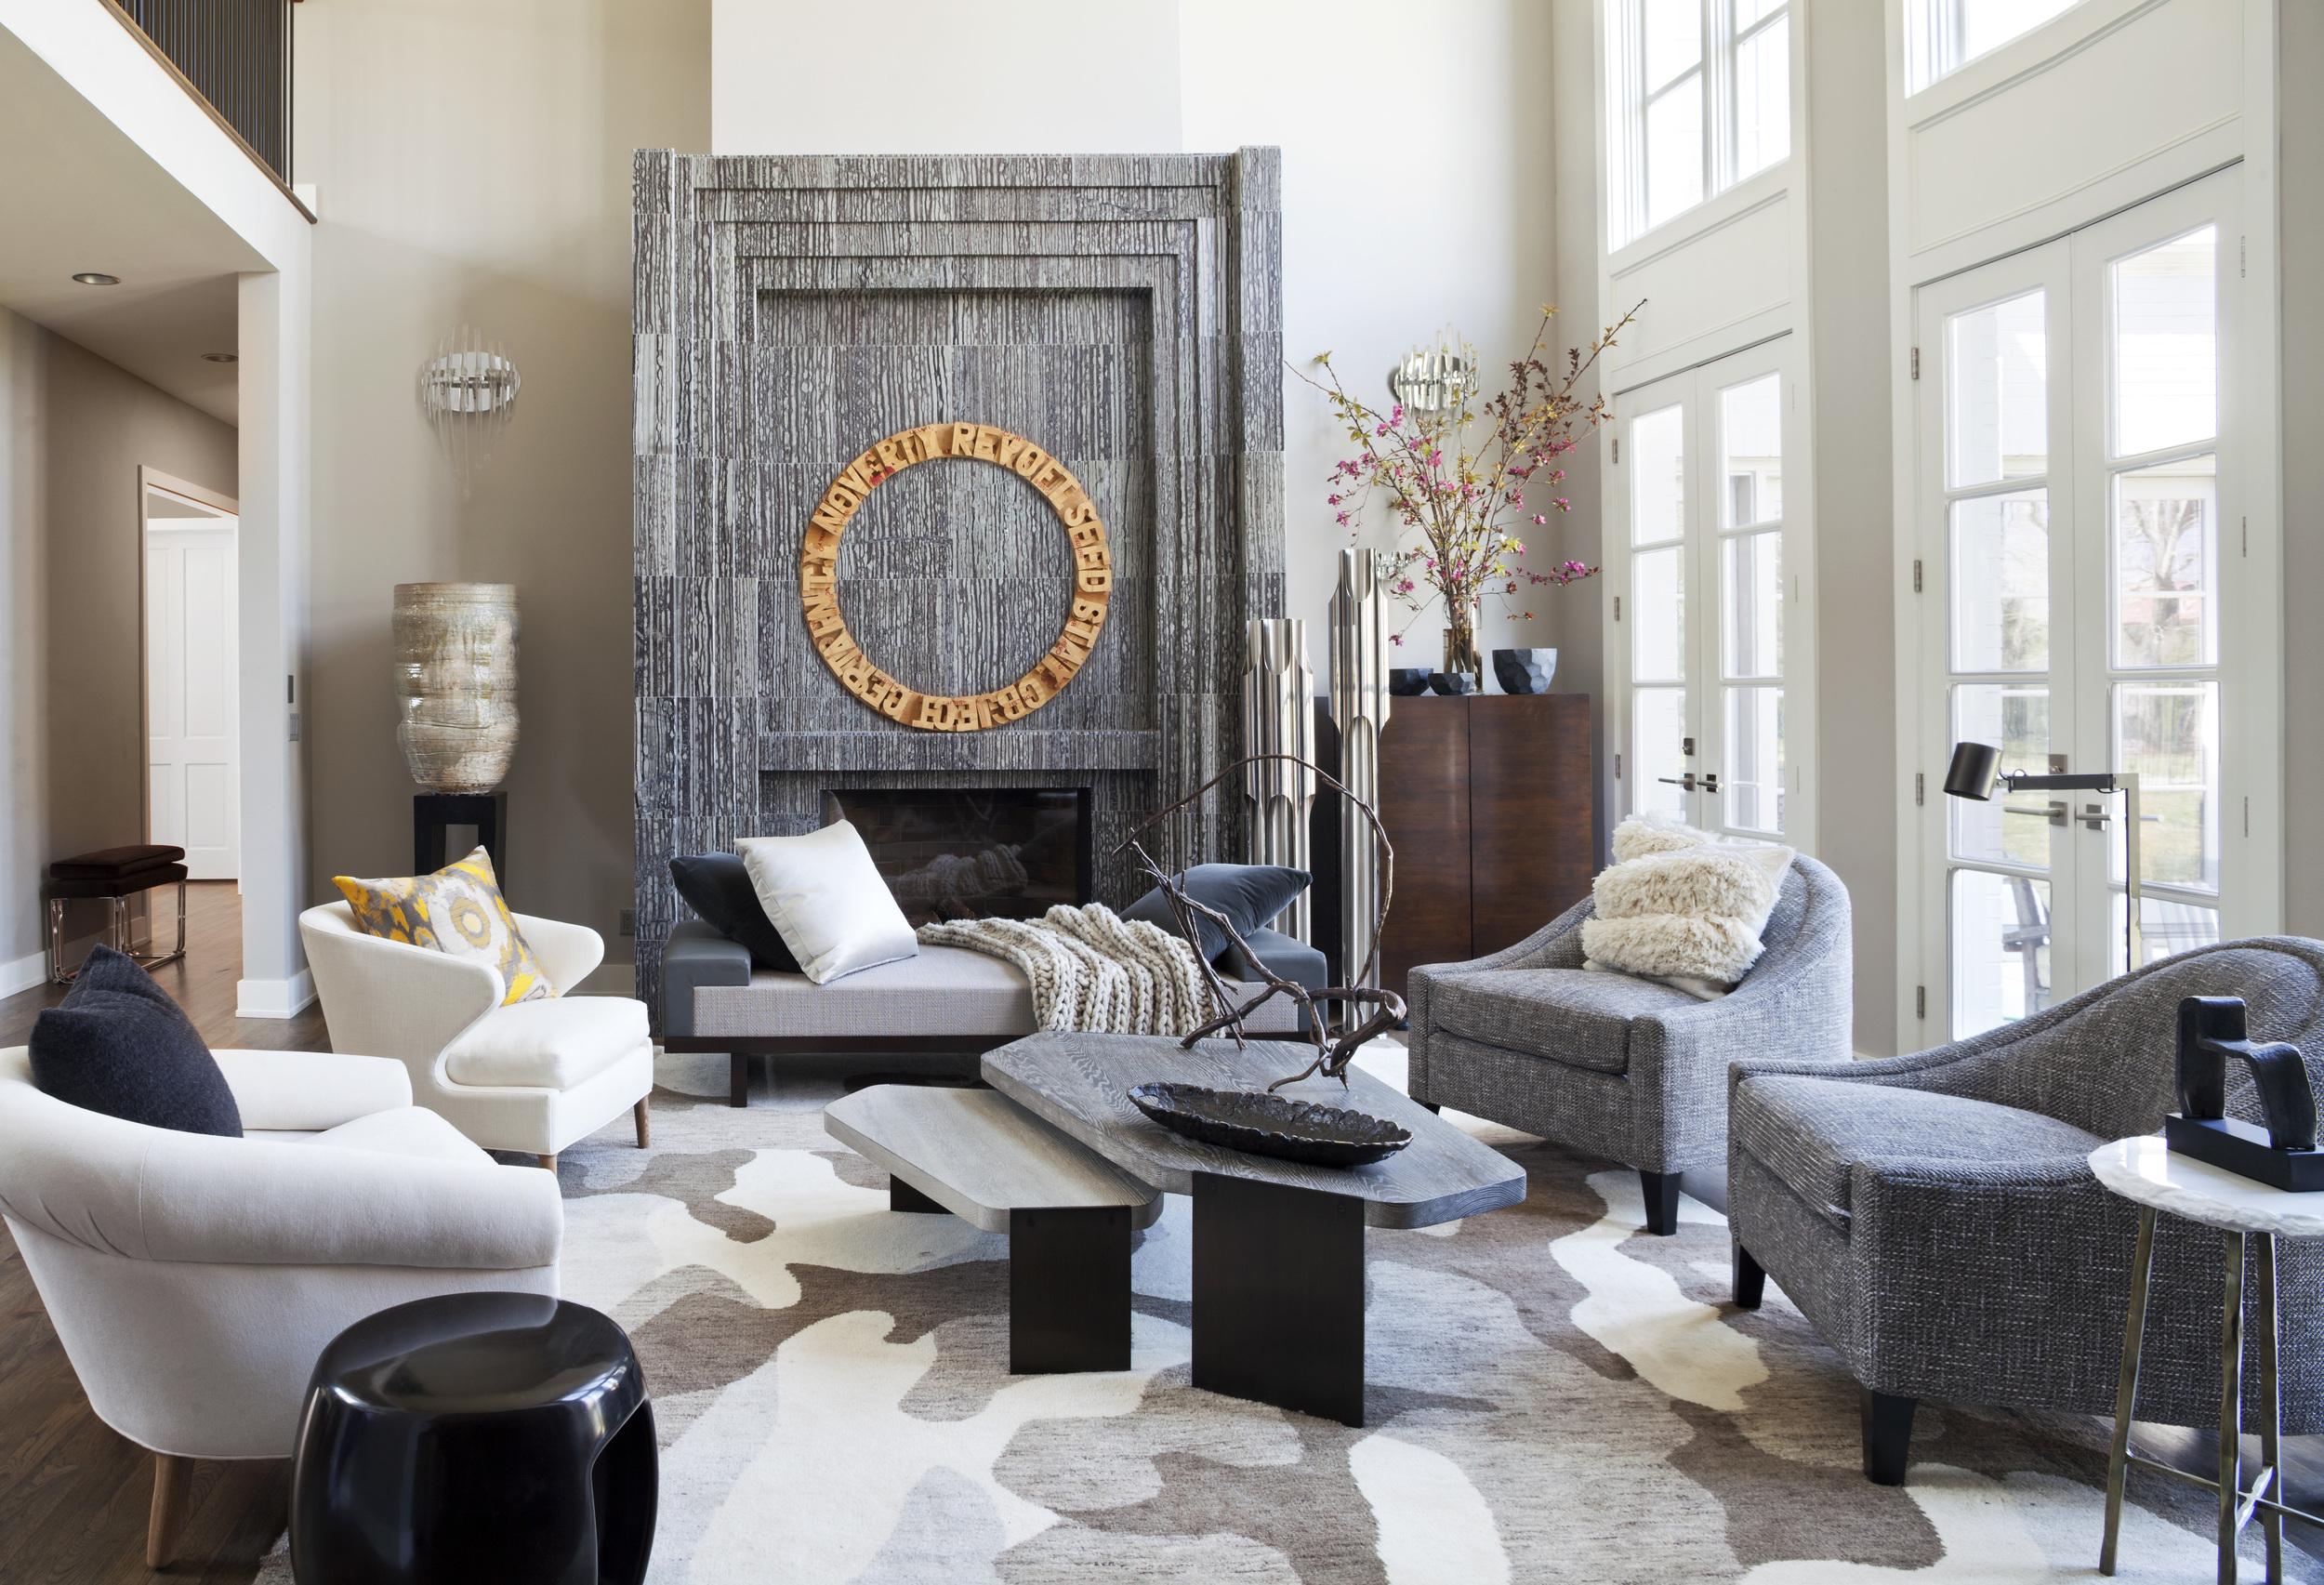 Private Residence. Design: Petra Richards Interiors. Photographer: Emily MInton Redfield. Showroom: TOWN Studio. Artist: Roland Bernier.